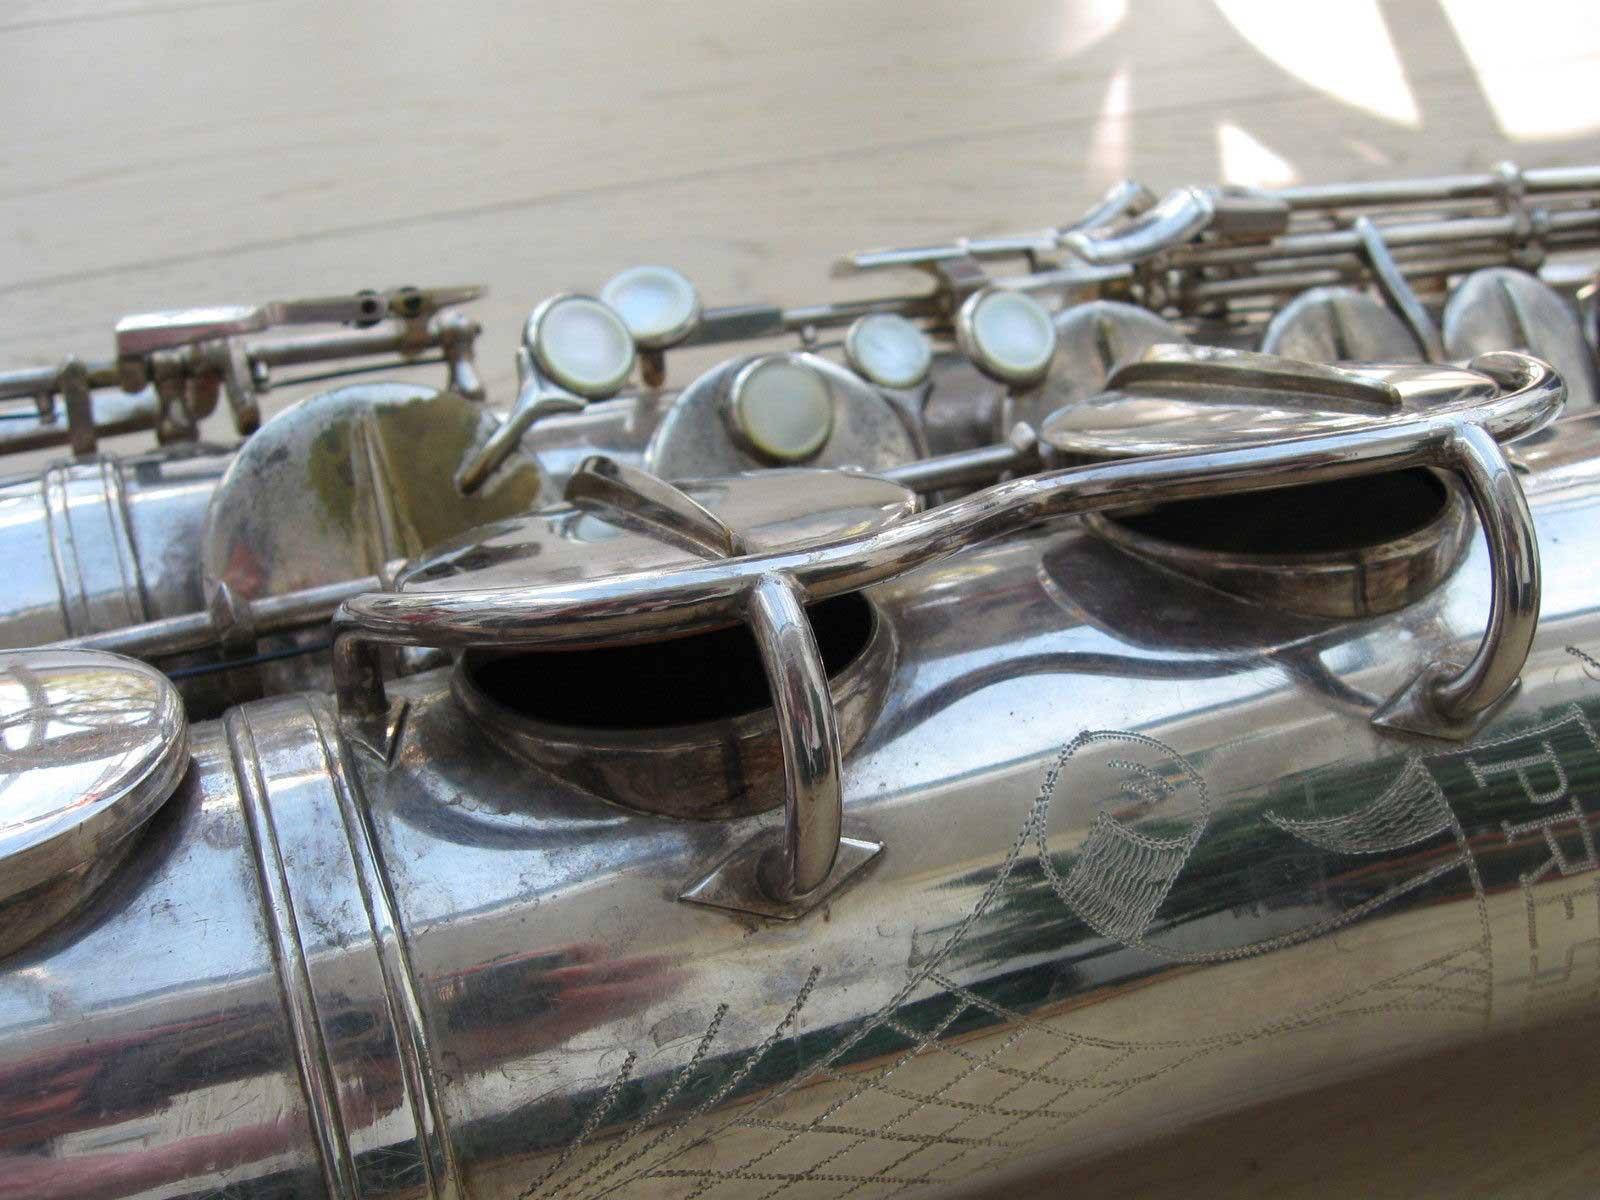 Hohner President, tenor sax, vintage sax, German sax, Max Keilwerth, bevelled tone holes, saxophone tone holes